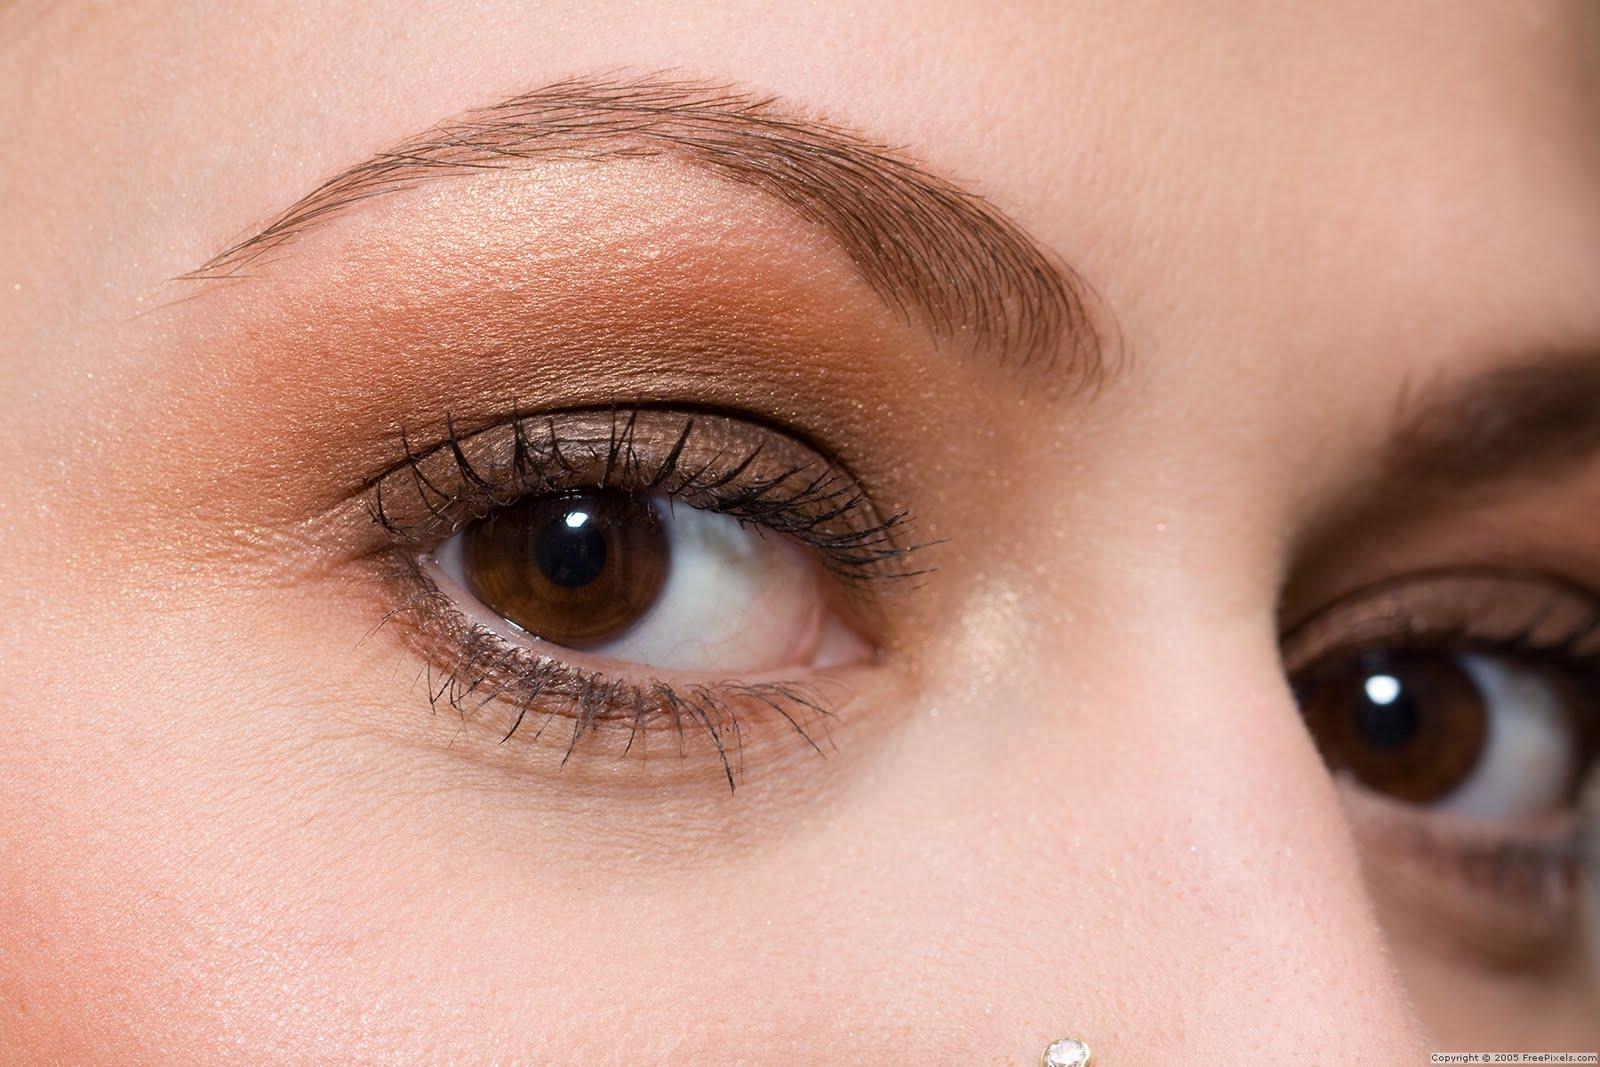 rias natural adalah make up transparan nude make up atau no make up